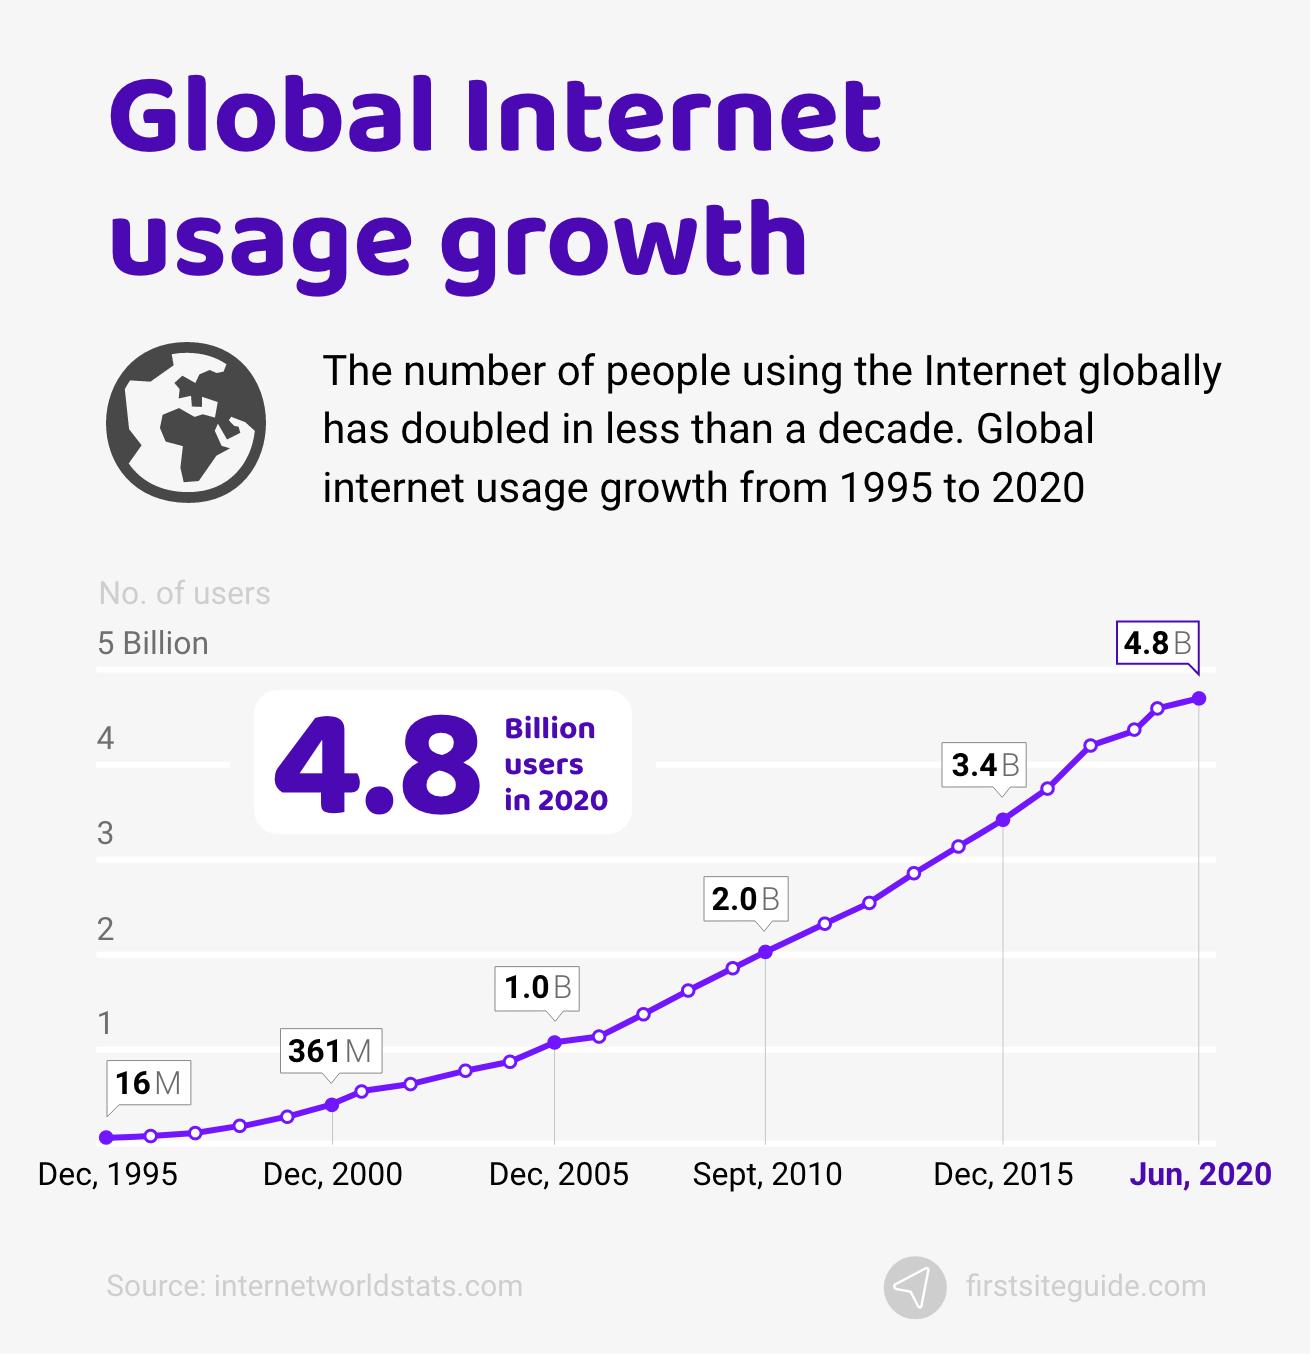 Global internet usage growth